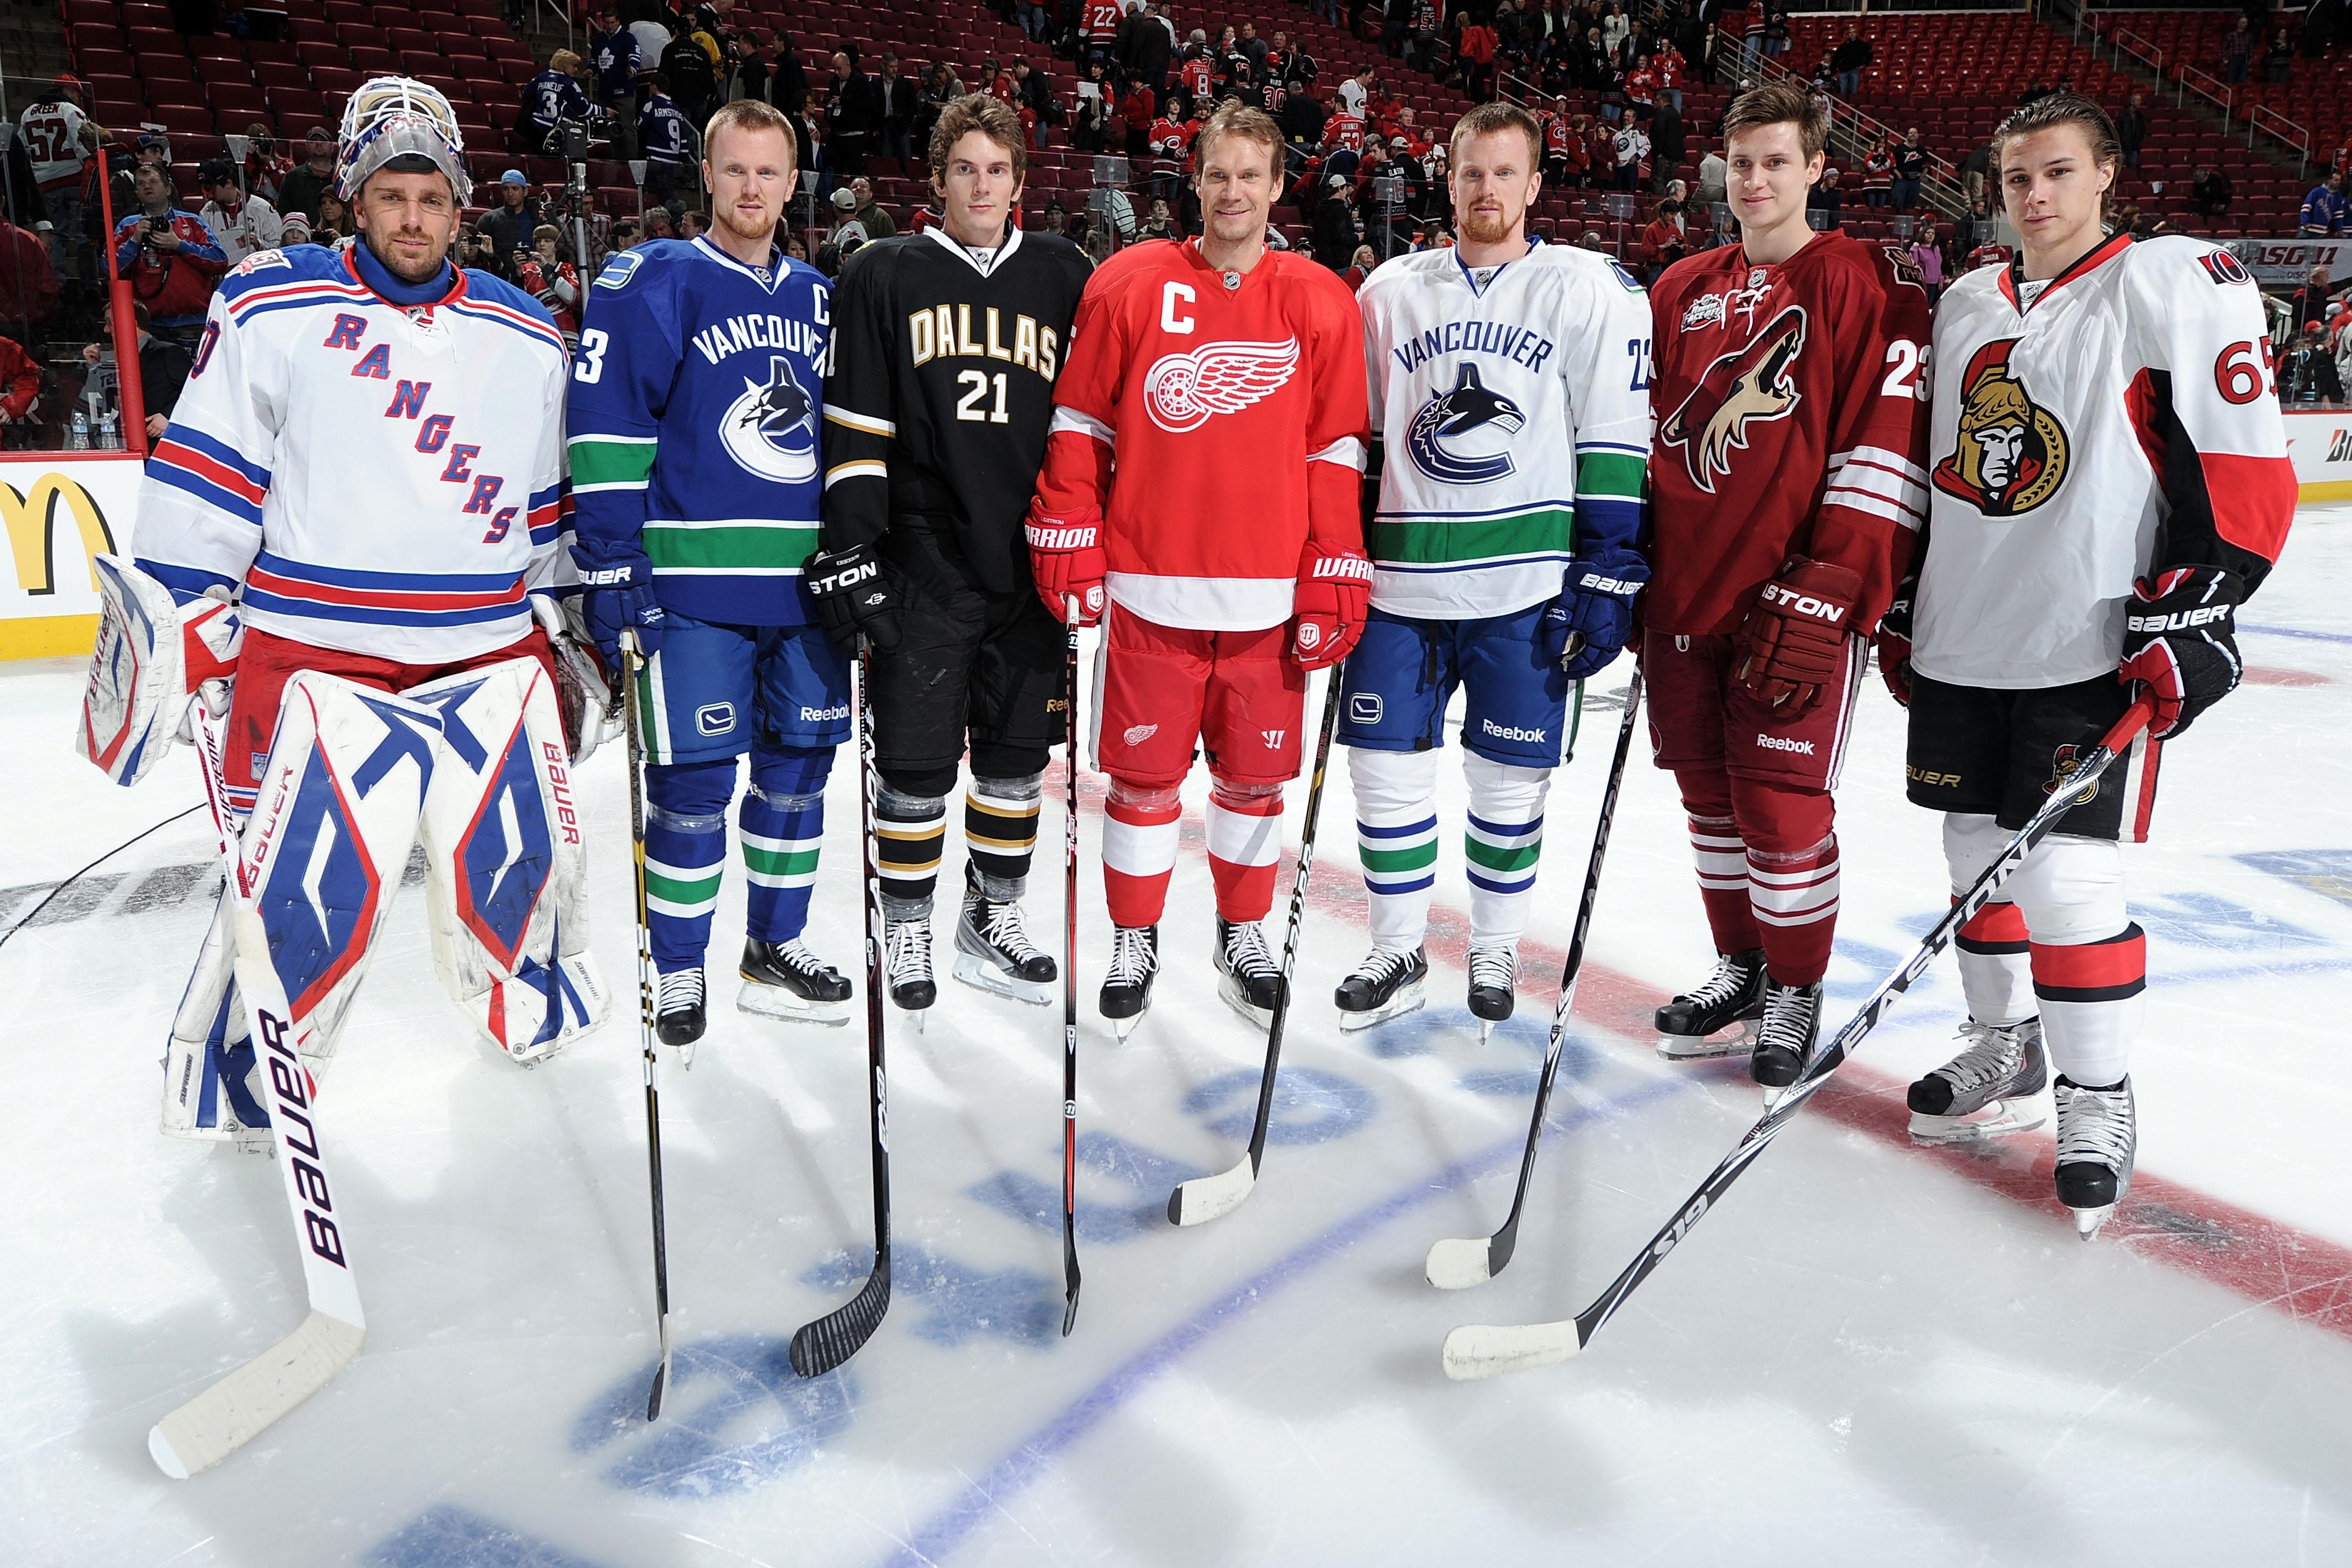 RALEIGH, NC - JANUARY 29:  (L-R) Henrik Lundqvist #30 of New York Rangers, Henrik Sedin #33 of the Vancouver Canucks, Loui Eriksson #21 of the Dallas Stars, Nicklas Lidstrom #5 of the Detroit Red Wings, Daniel Sedin #22 of the Vancouver Canucks, Oliver Ek